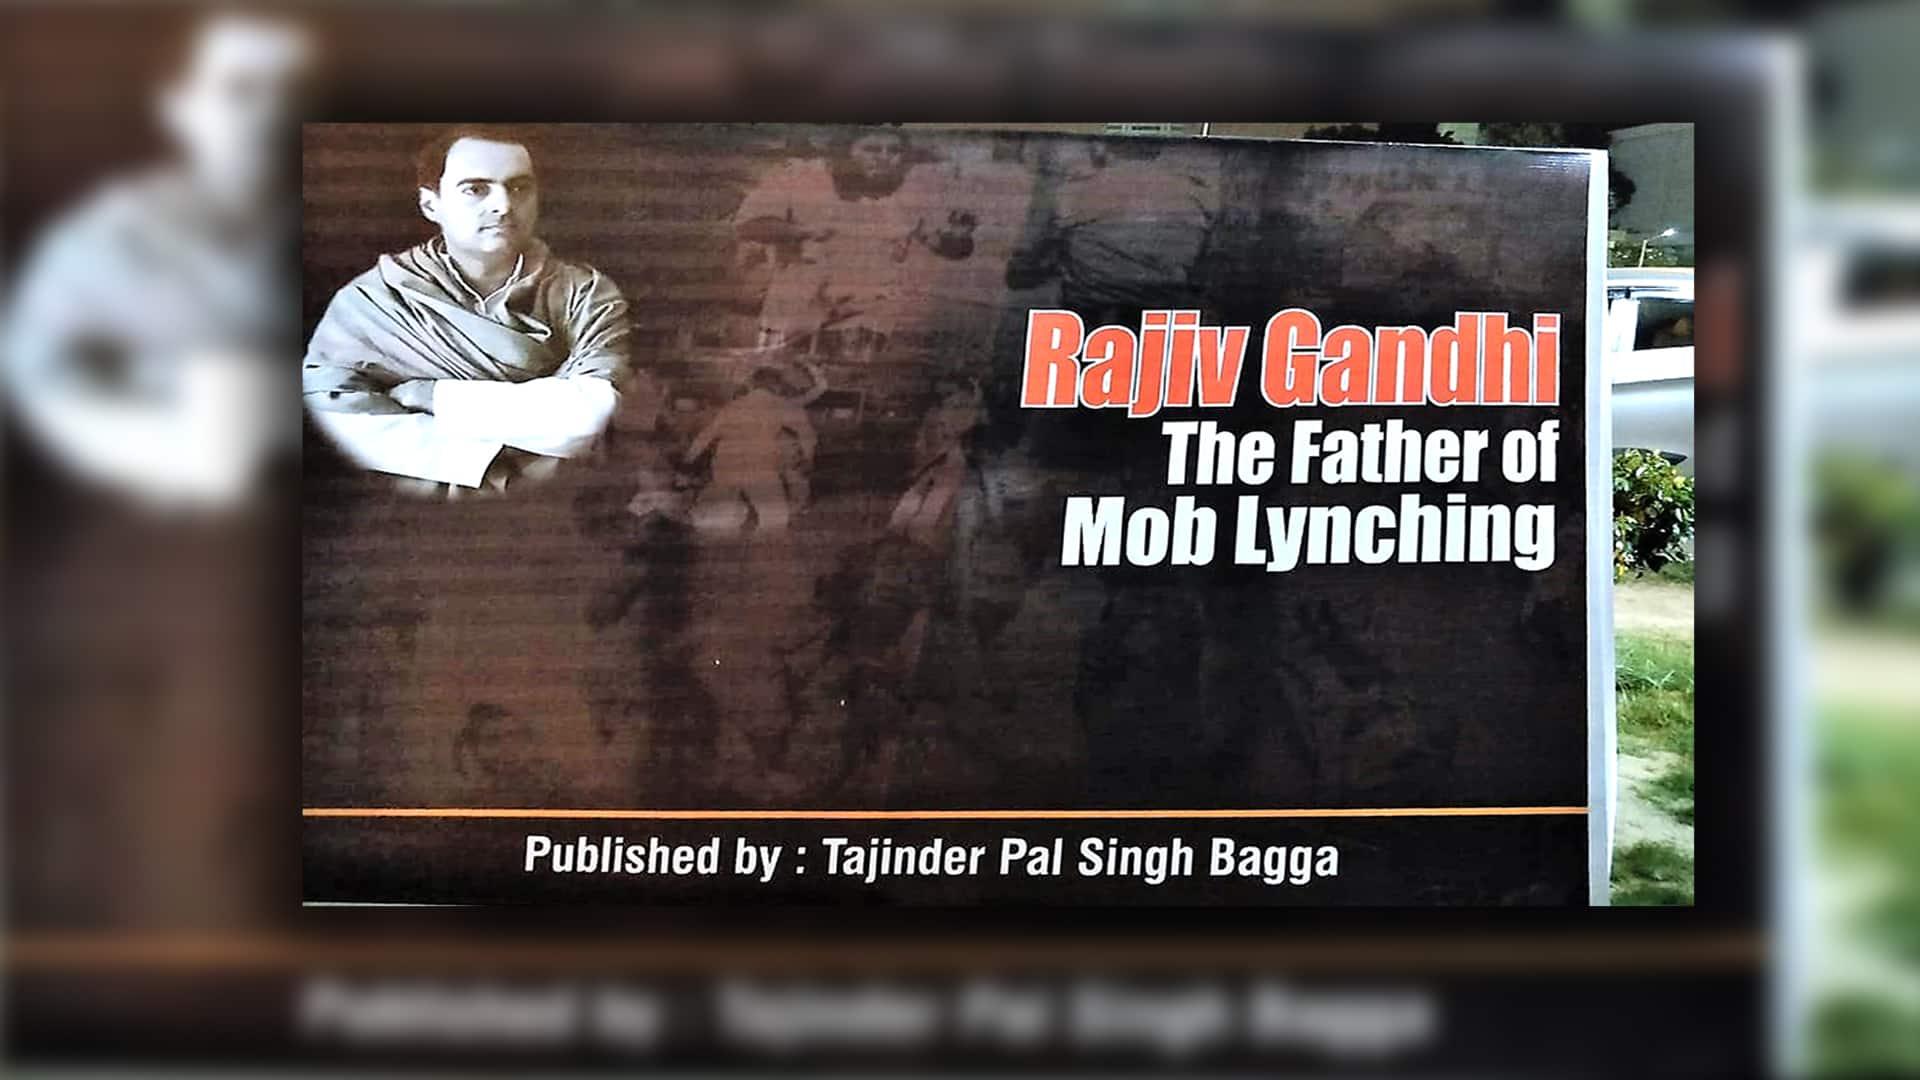 Rajiv Gandhi Father mob lynching Rahul Tajinder Bagga 1984 riots Congress